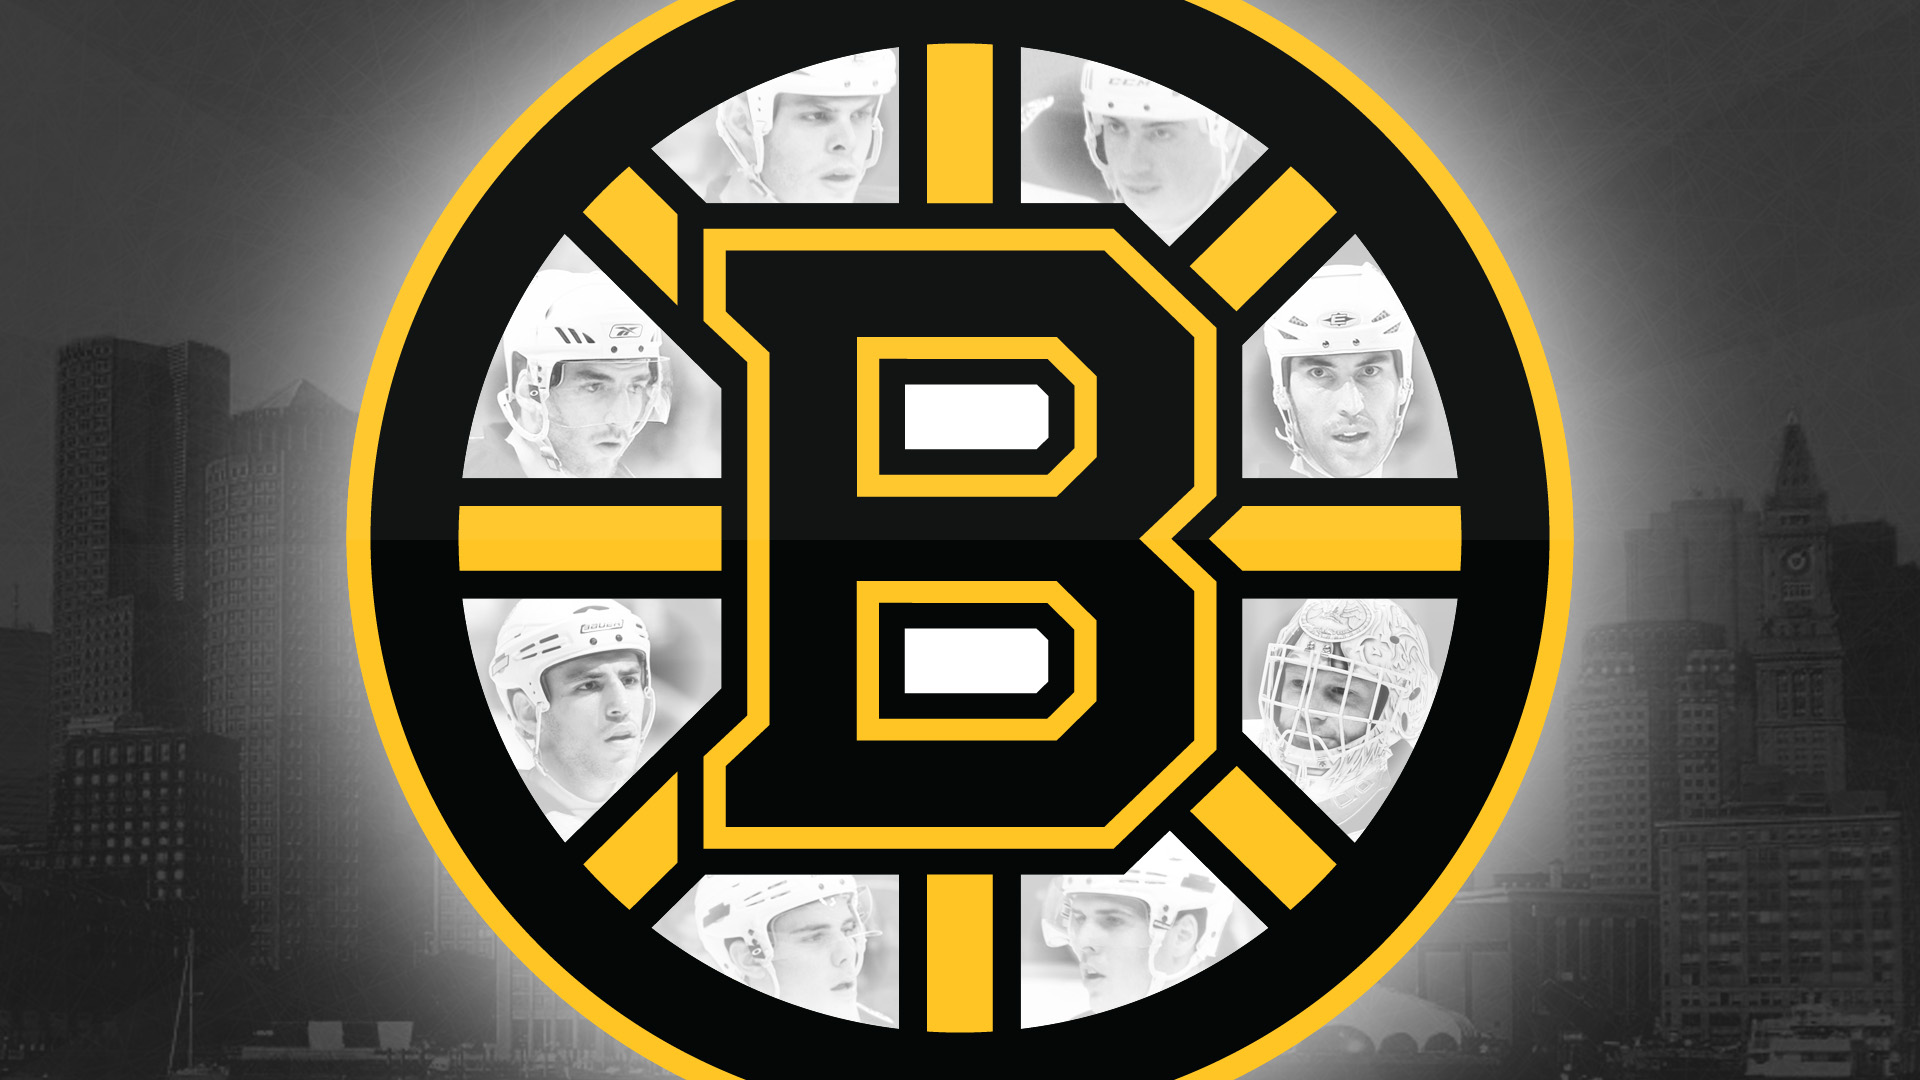 Bruins-hd-wallpaper-wp3603725